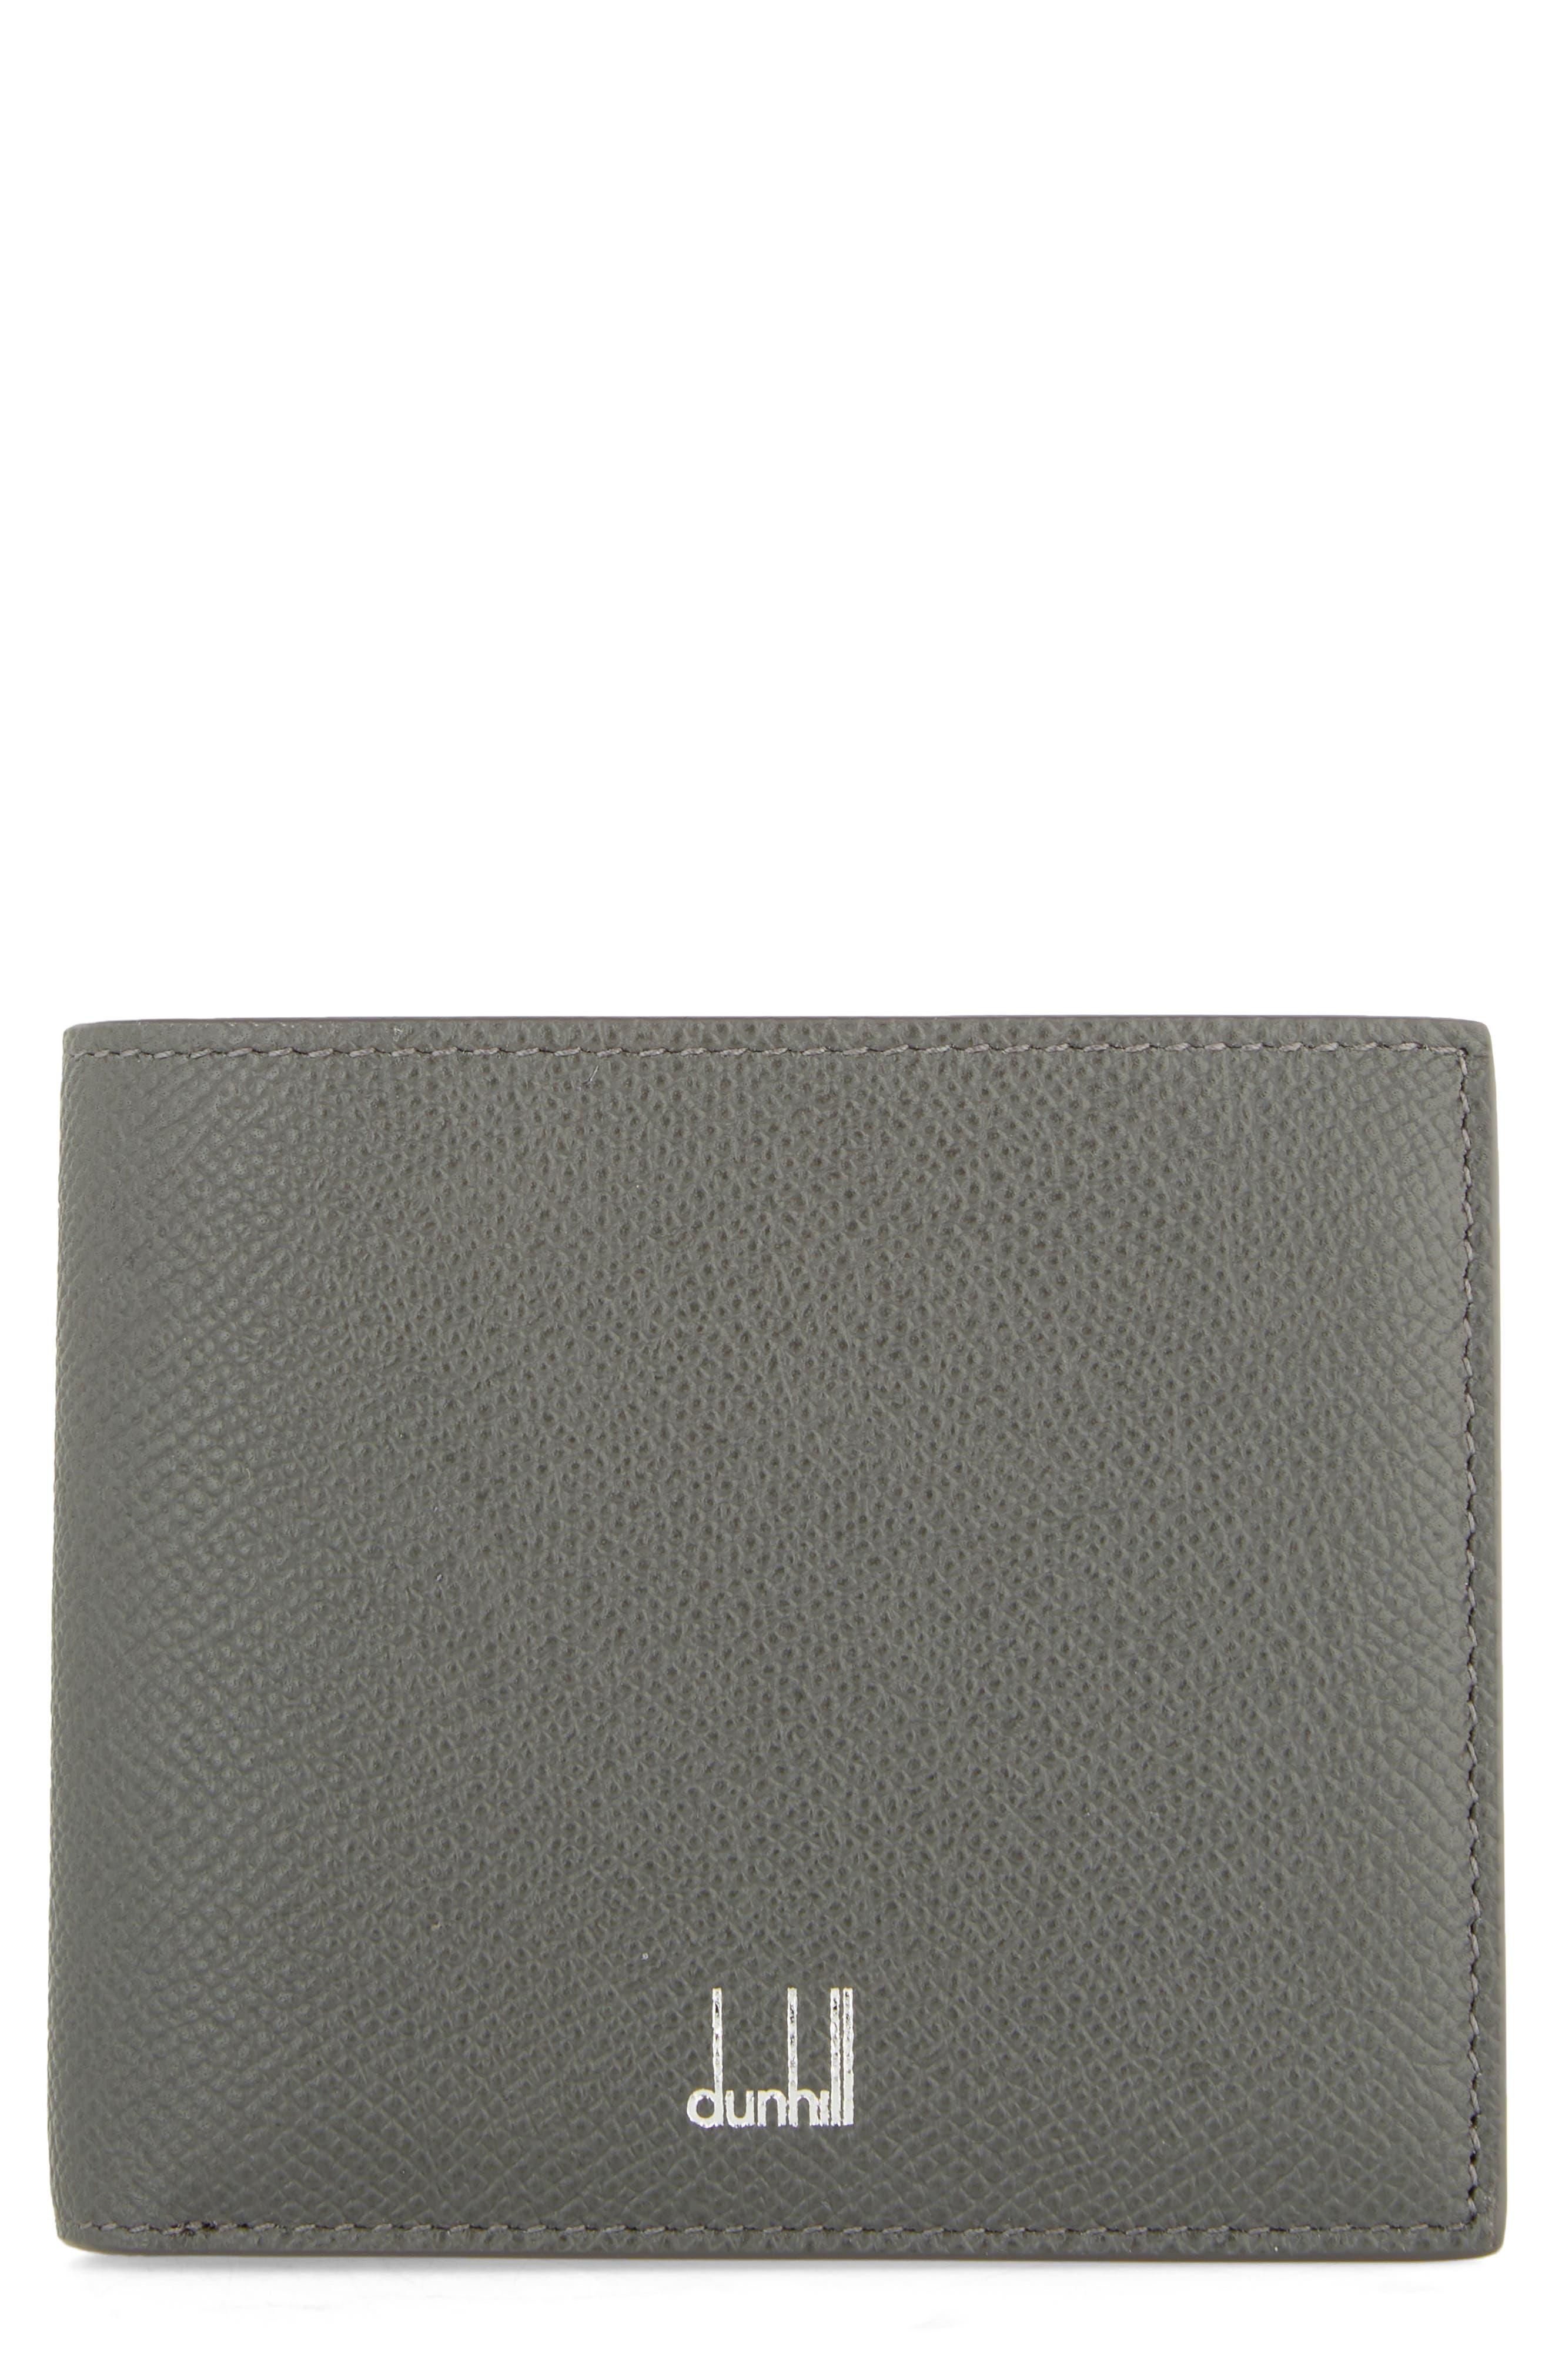 Dunhill Cadogan Leather Wallet - Grey